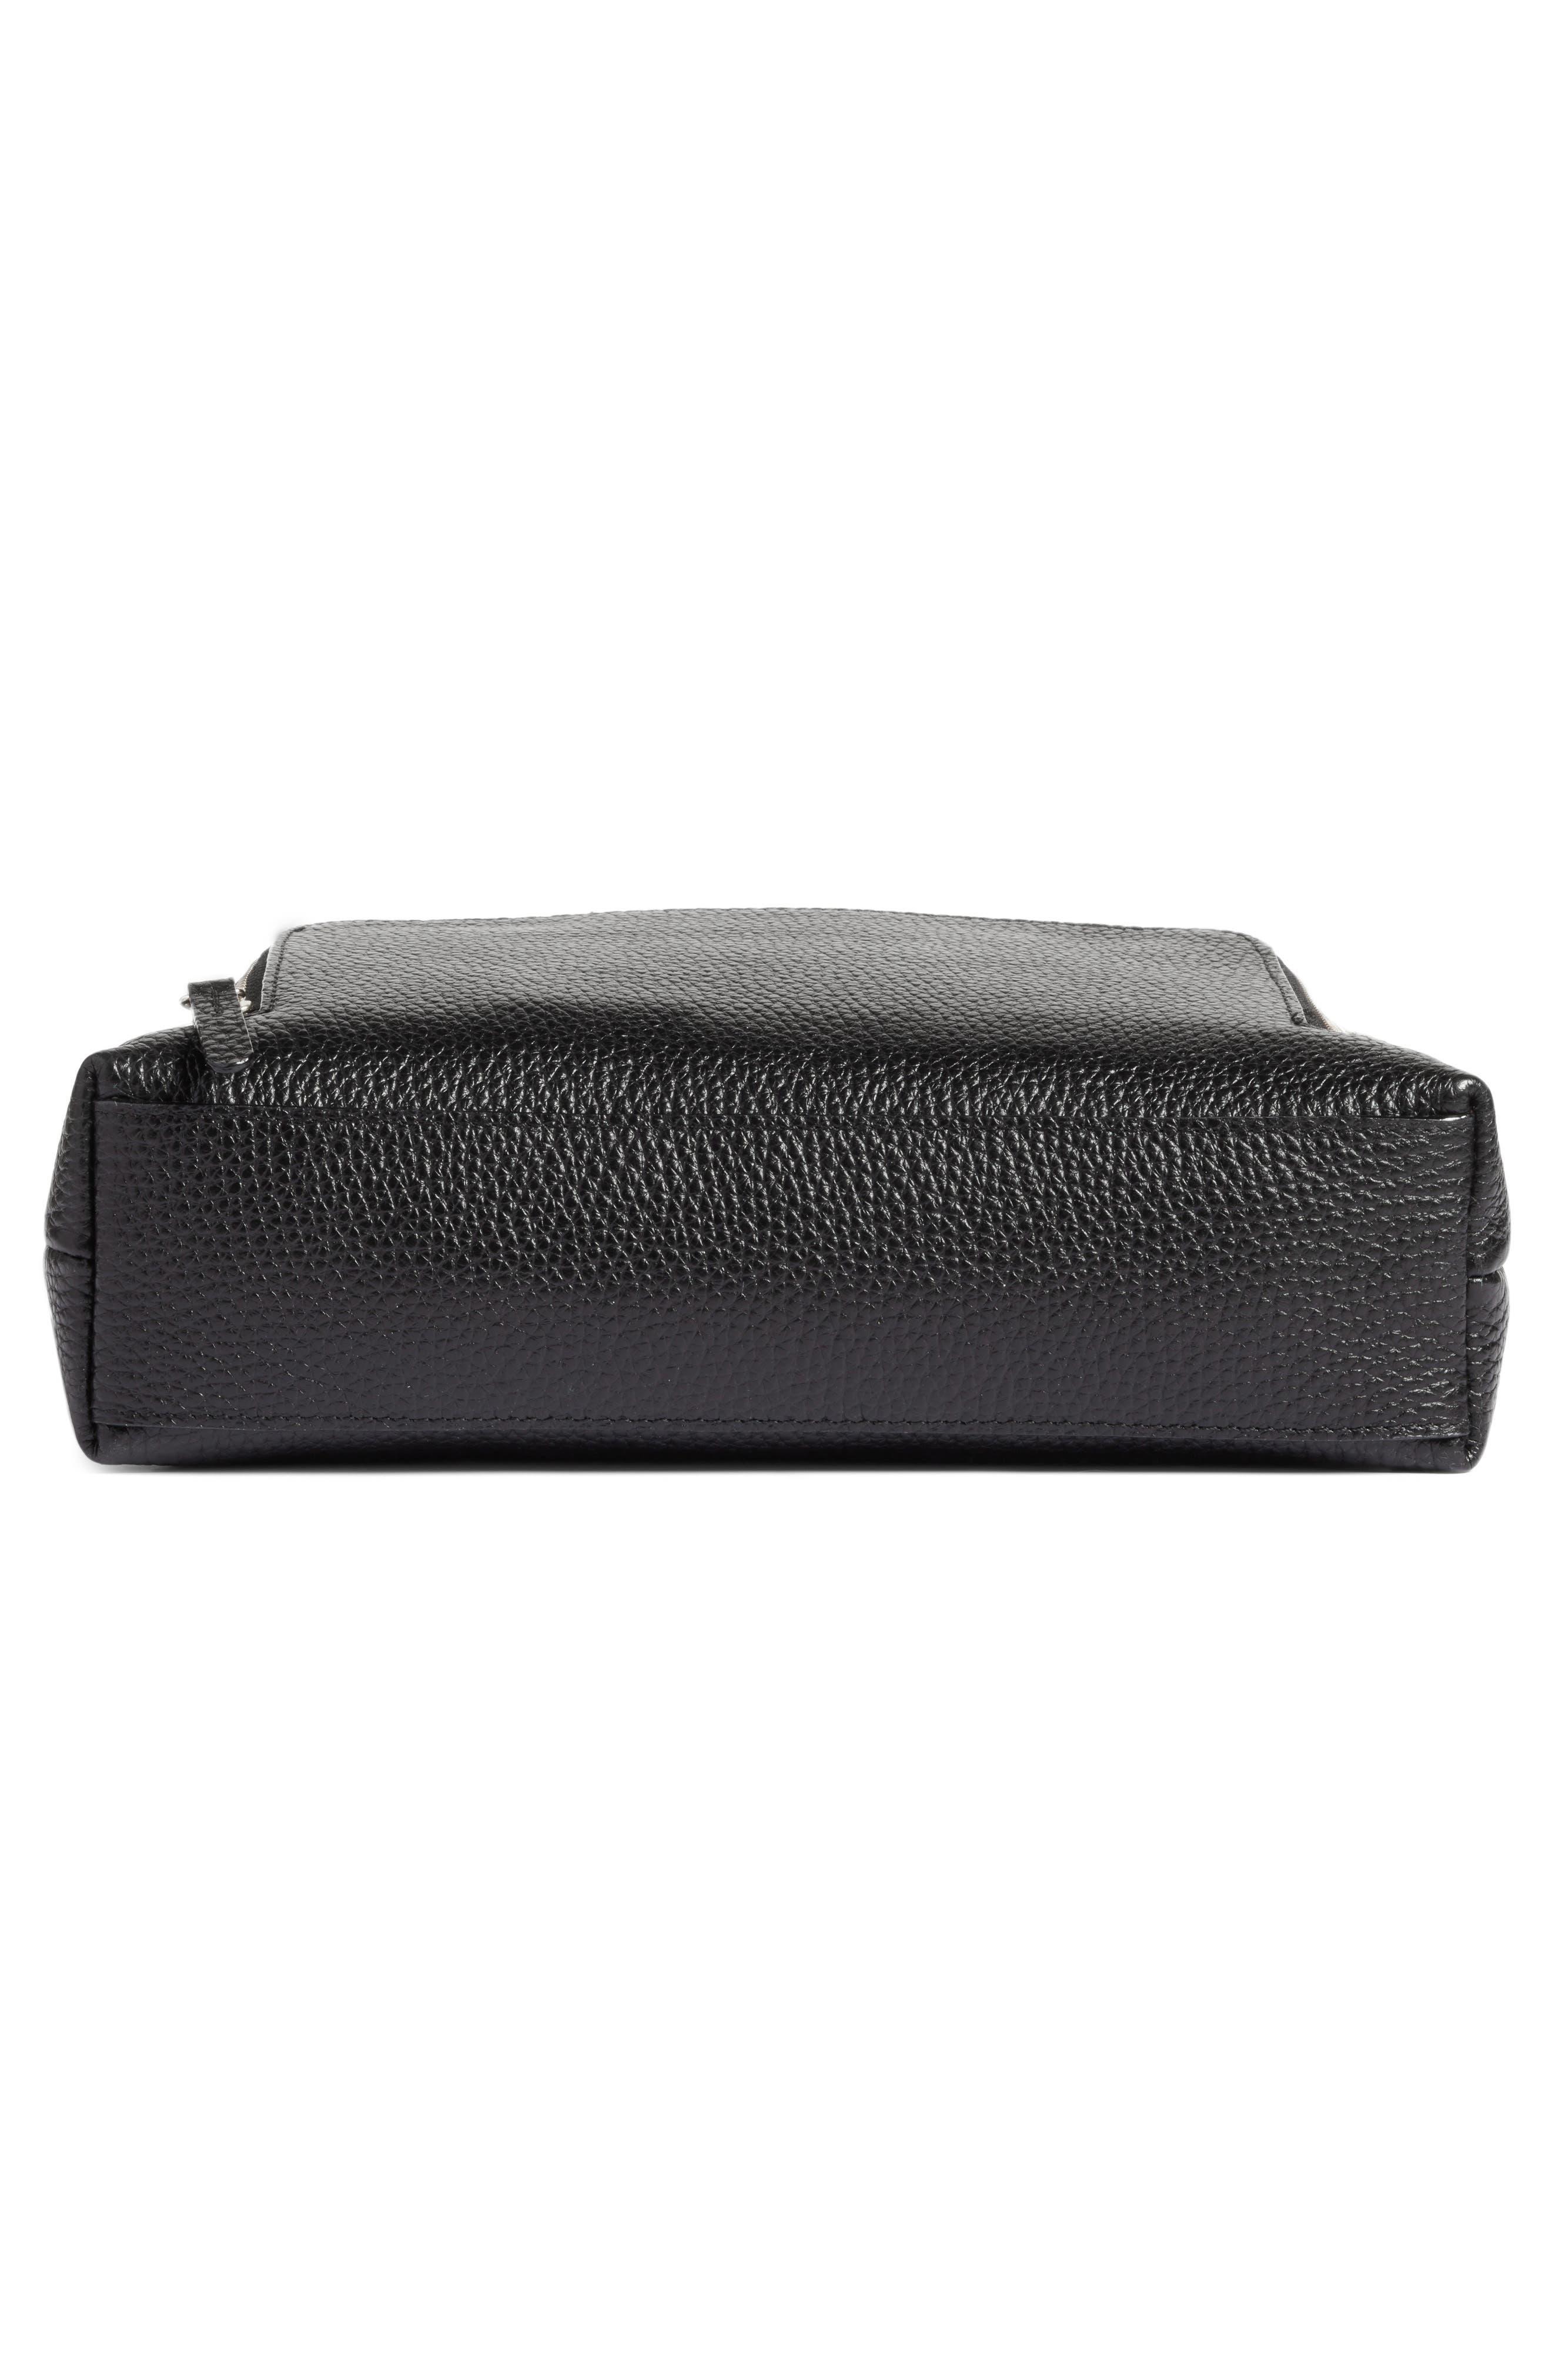 Pebbled Leather Crossbody Bag,                             Alternate thumbnail 6, color,                             Black